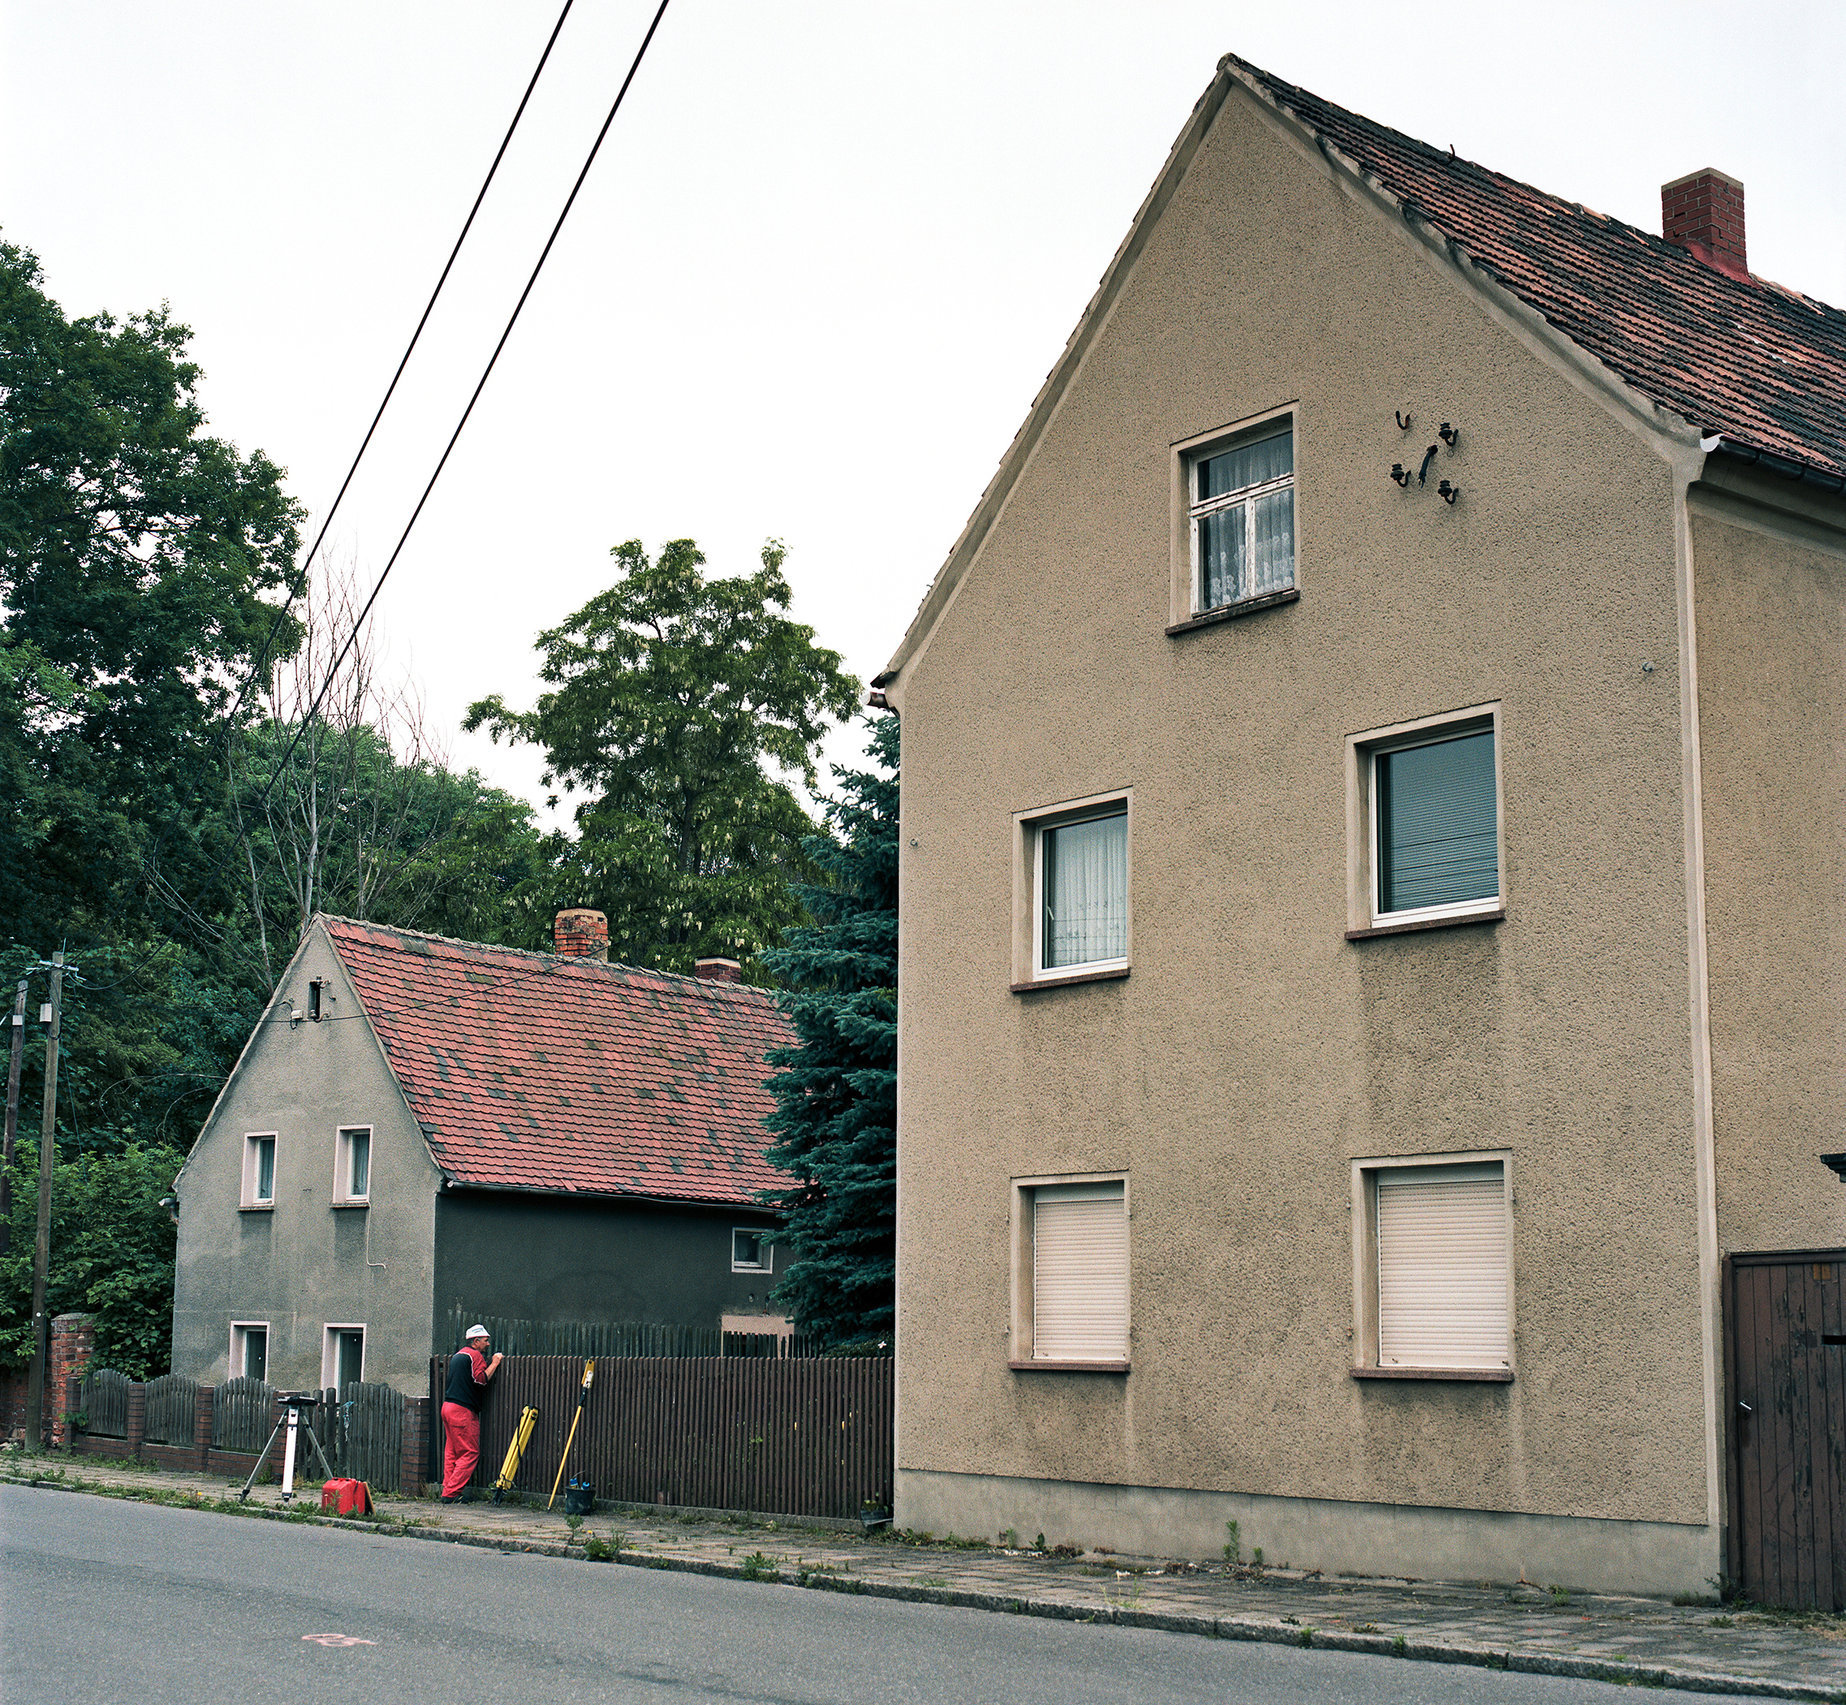 Heuersdorf_Roll_9_Frame_06_MASTER_crop.jpg